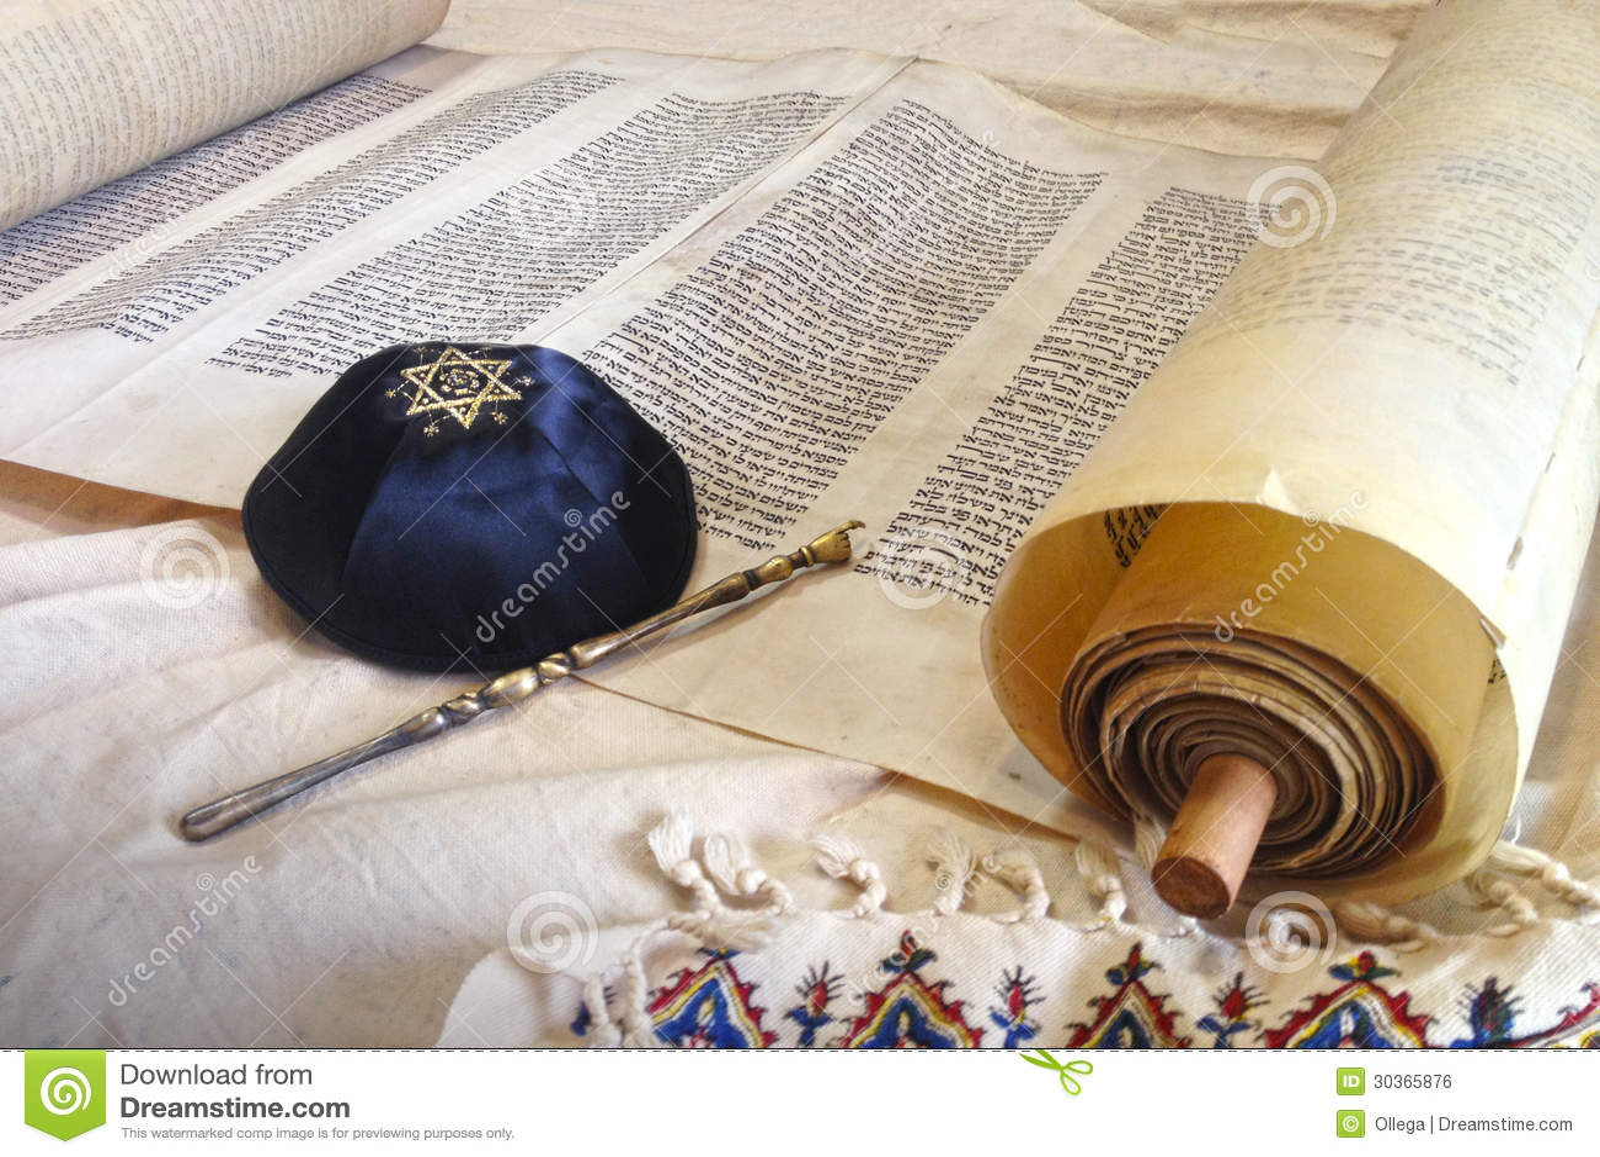 Torah scroll with Kippah